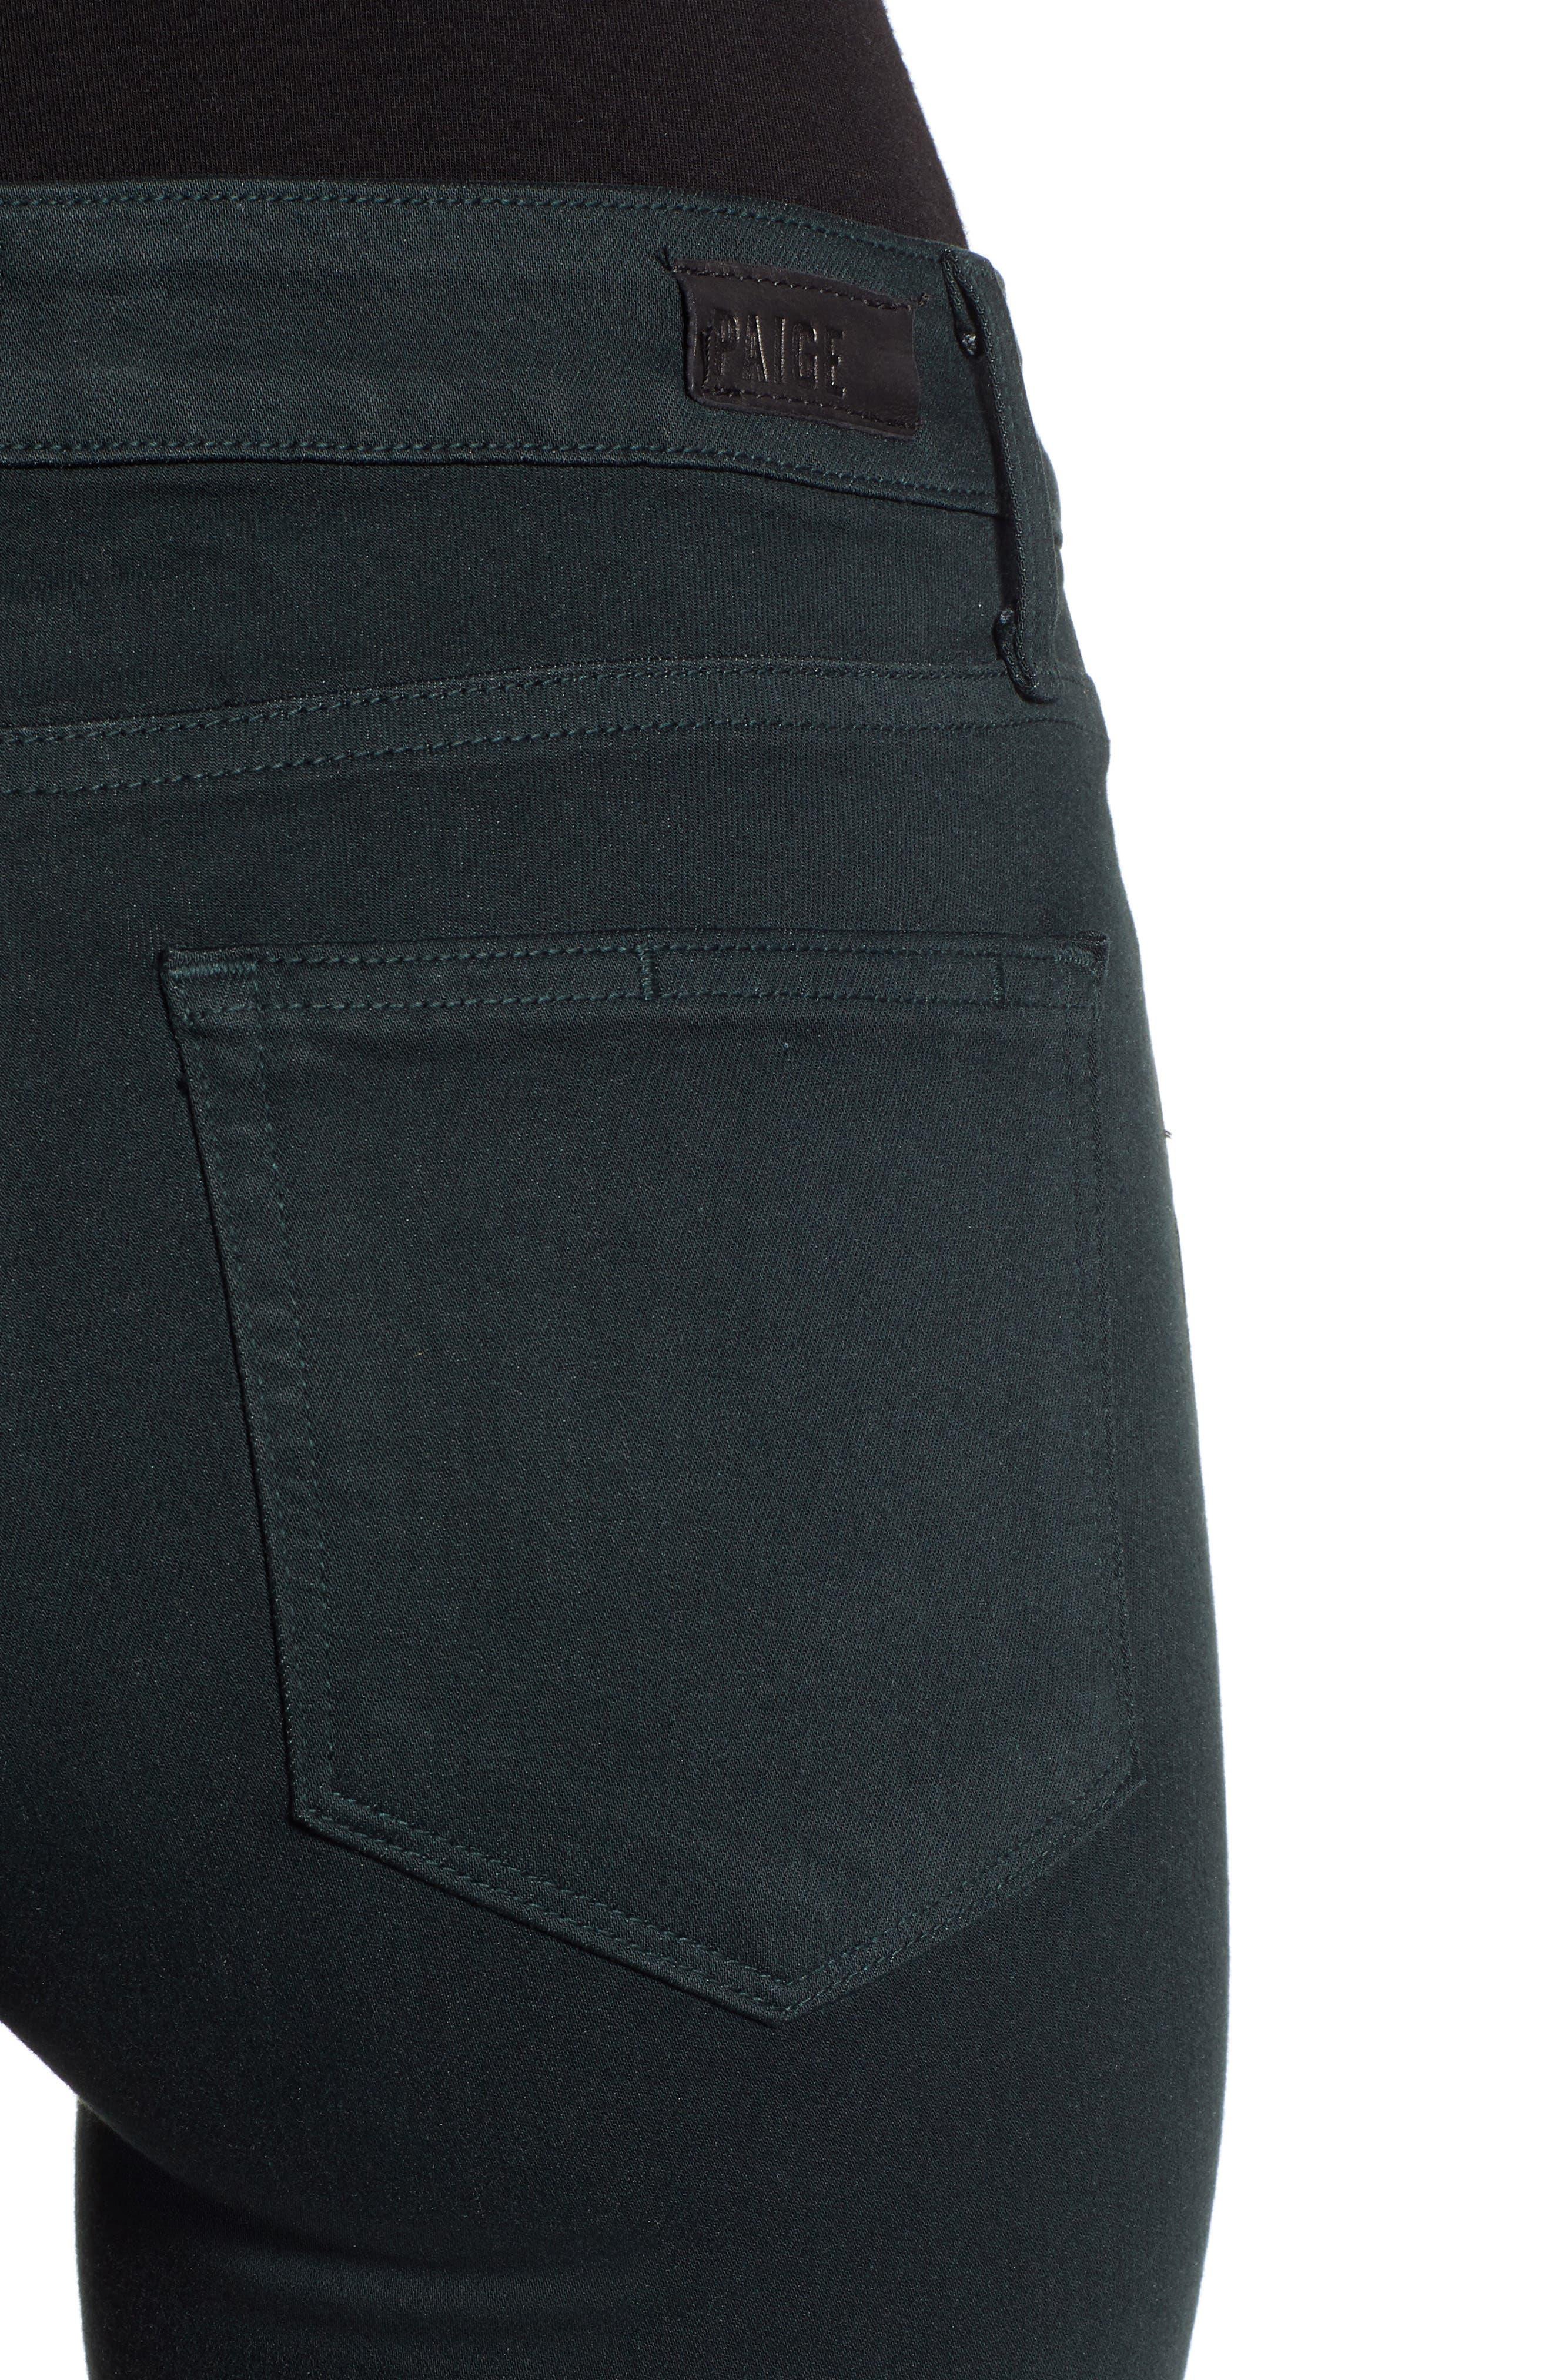 Transcend - Verdugo Ultra Skinny Jeans,                             Alternate thumbnail 4, color,                             MIDNIGHT GREEN